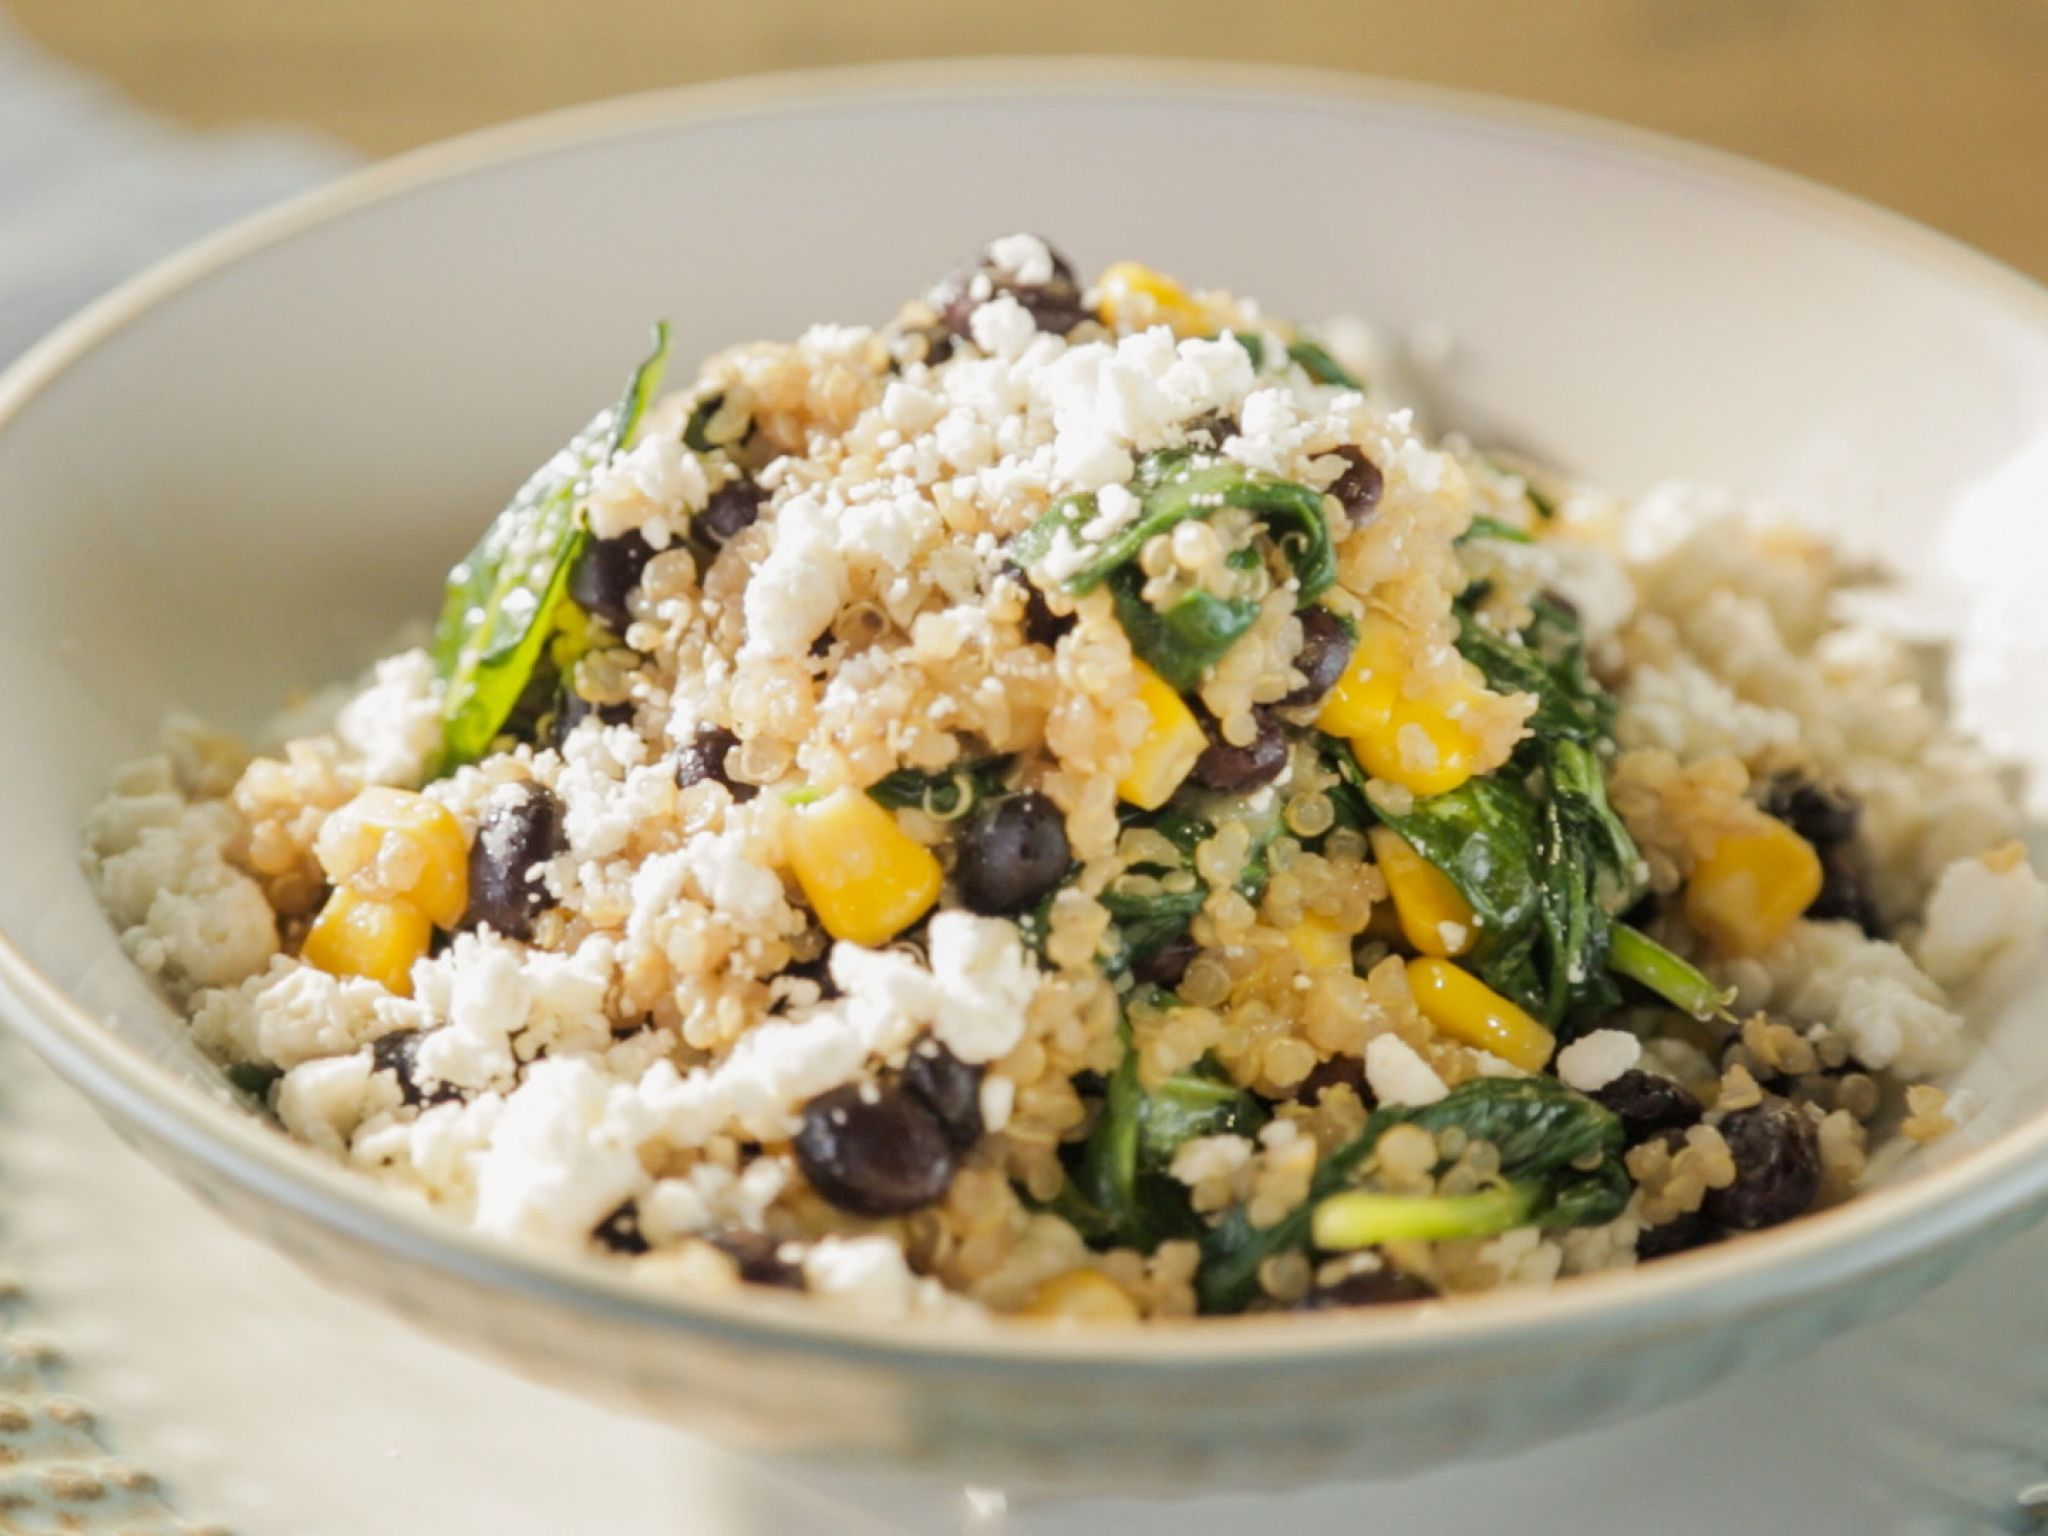 Black bean feta quinoa bowl recipe trisha yearwood feta and quinoa forumfinder Choice Image